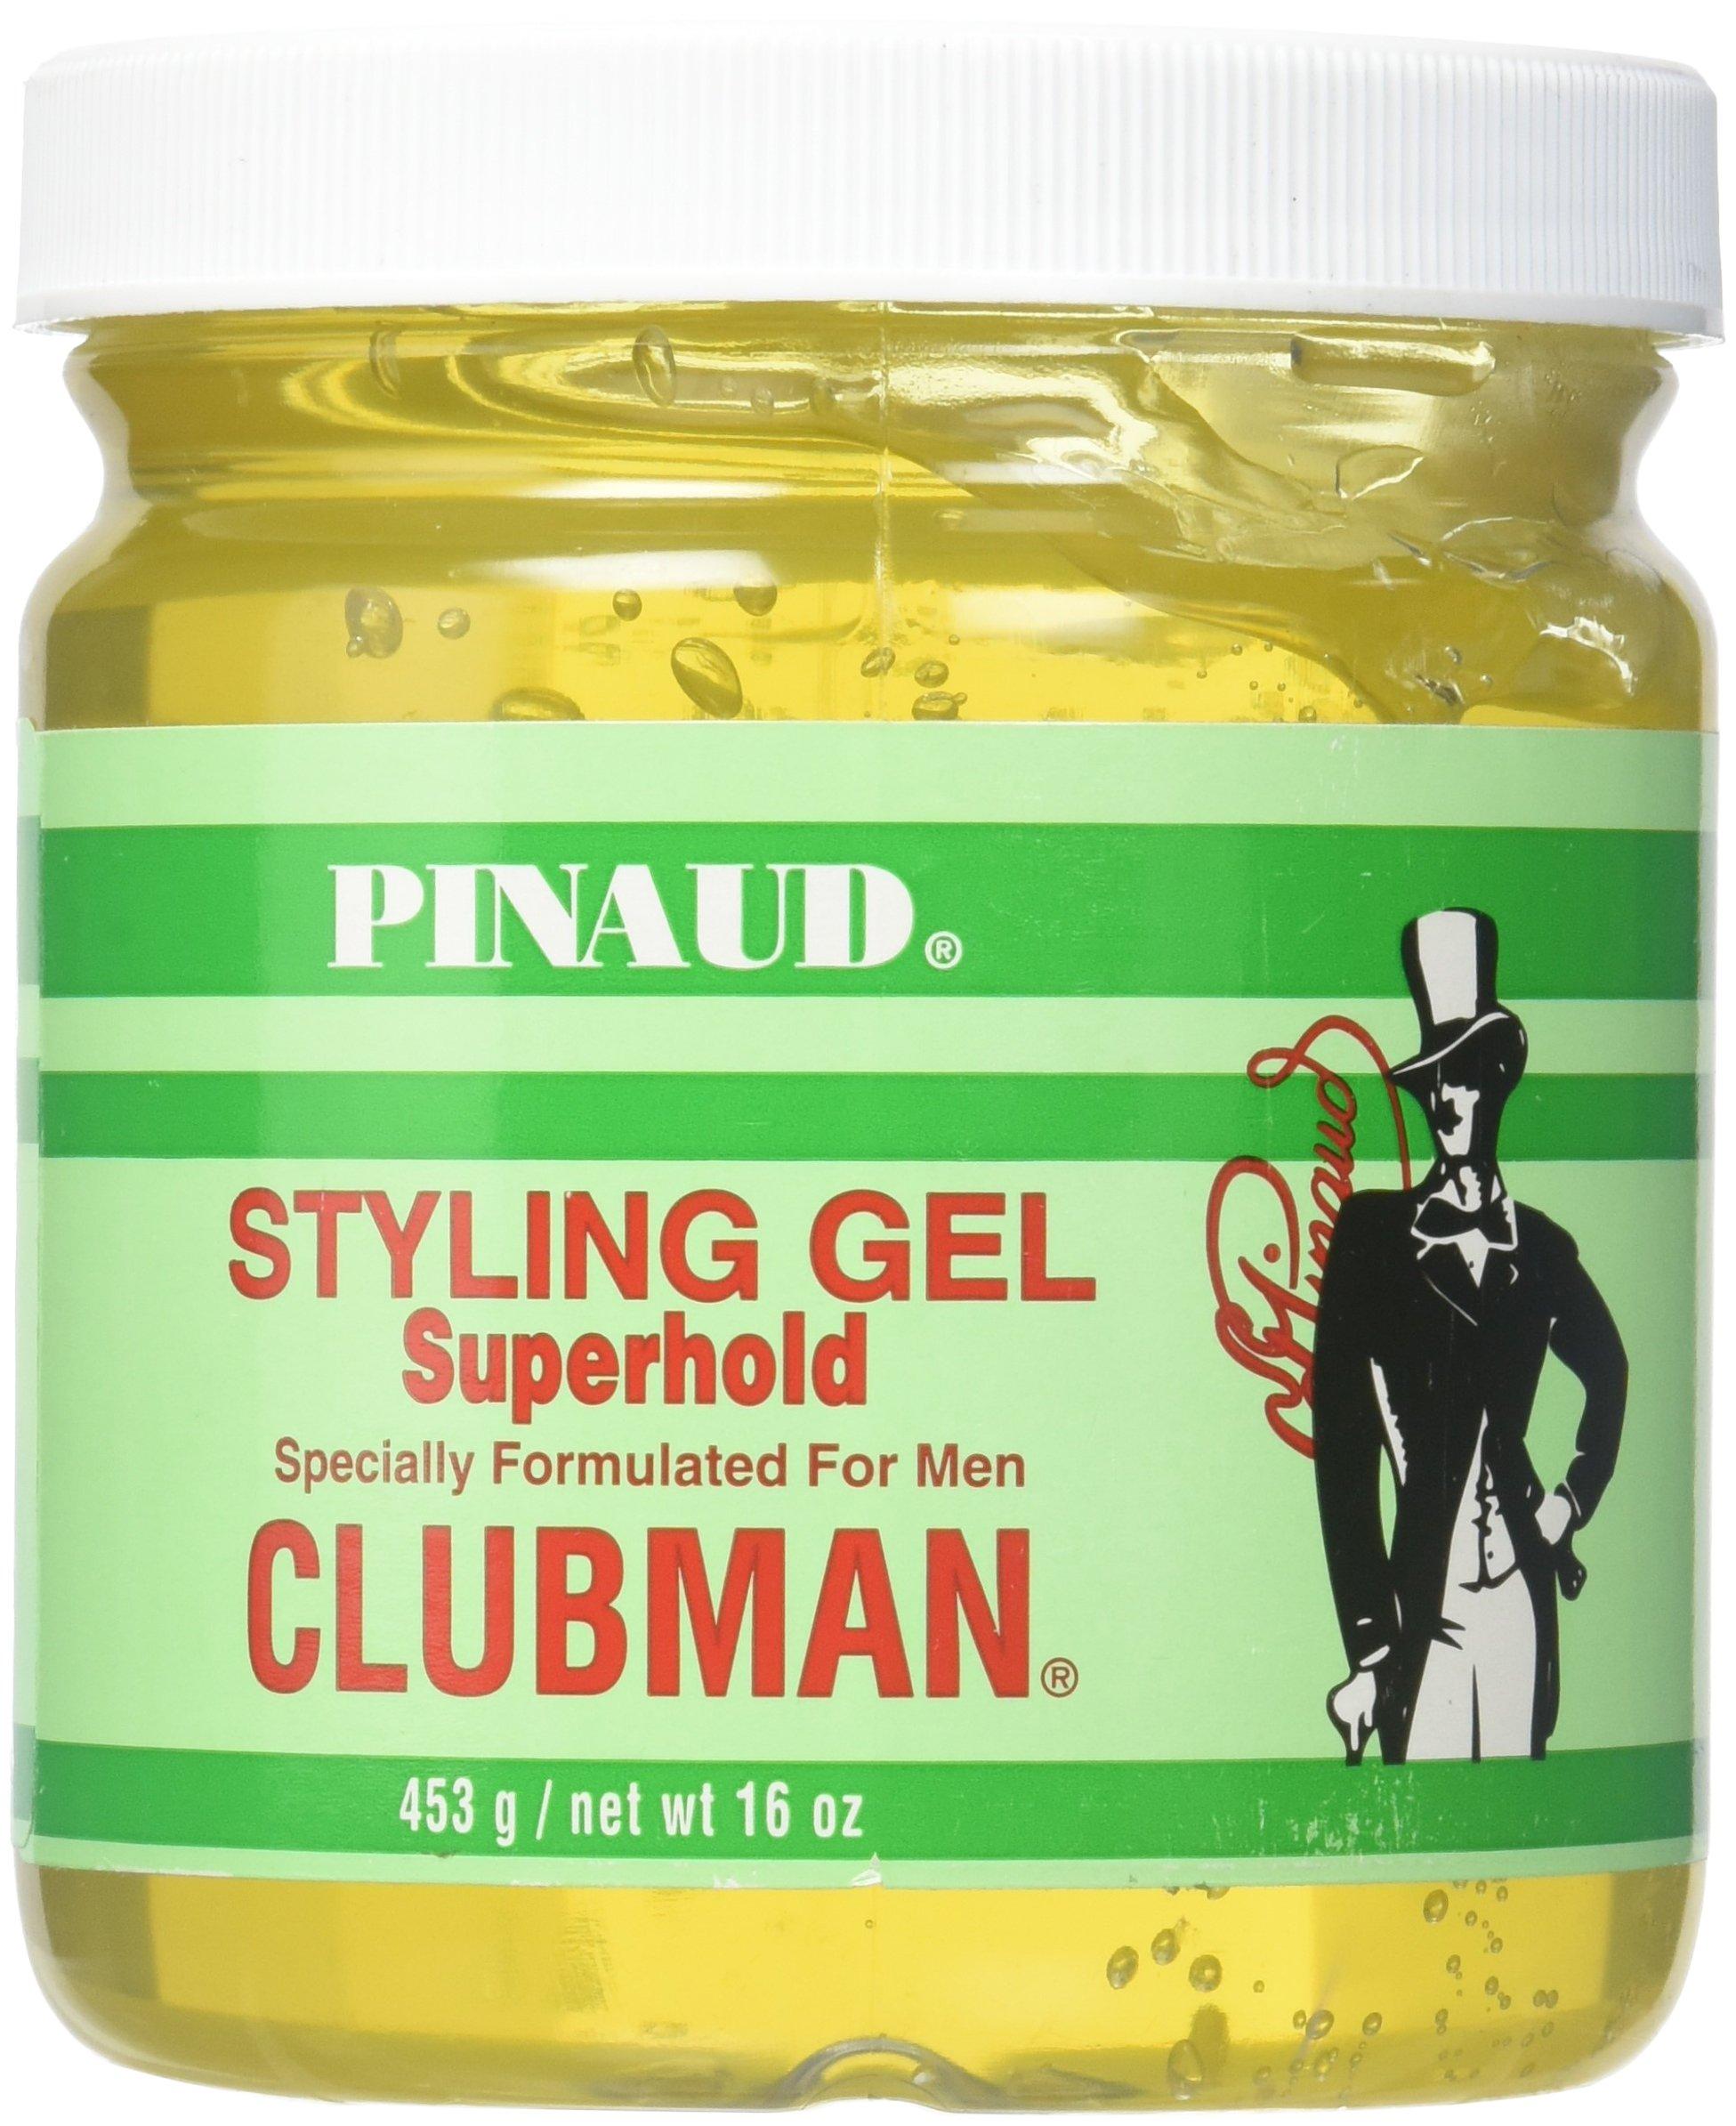 Clubman Superhold Styling Gel, 16 oz